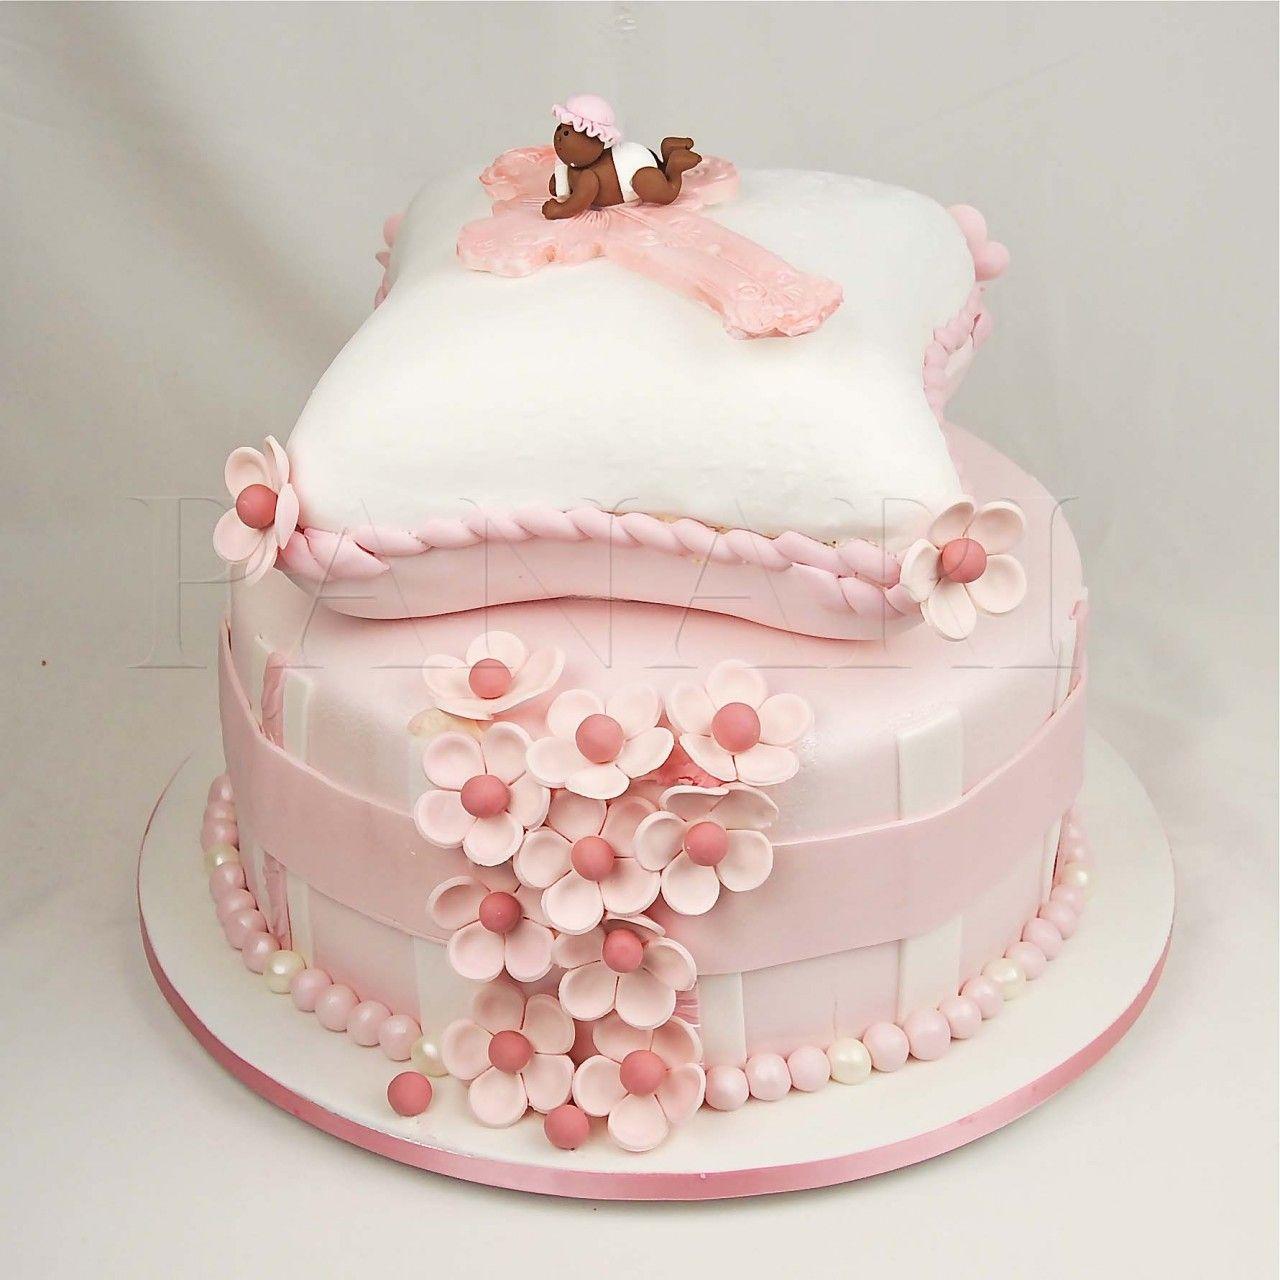 Farm Fresh Bakery Baby Shower Cakes